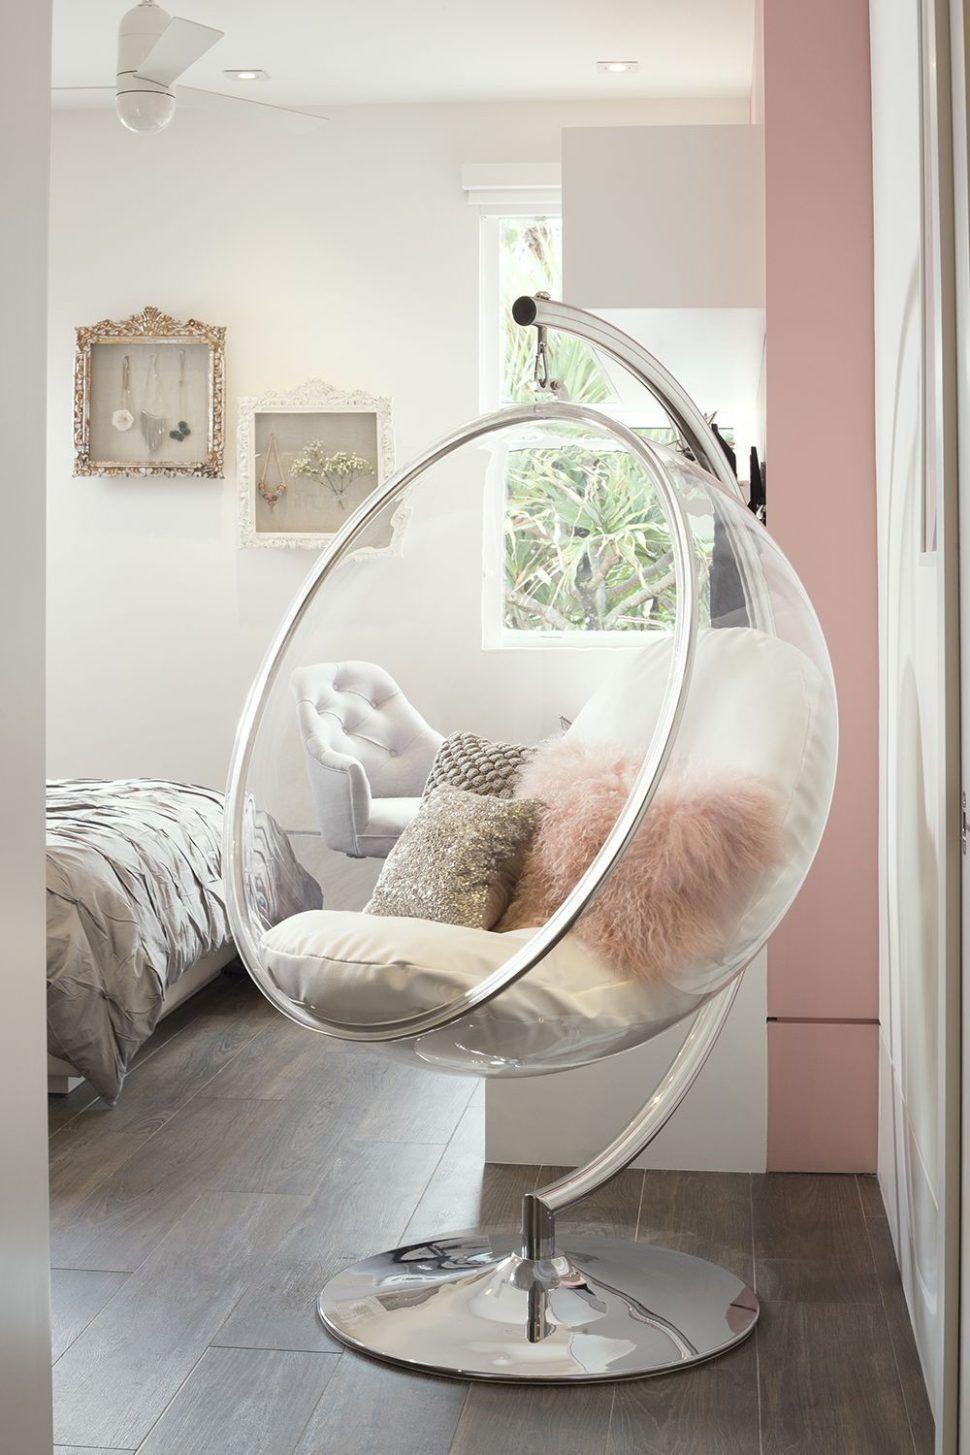 Bedroom Chair:Astonishing Chair For Teenage Girl Bedroom With